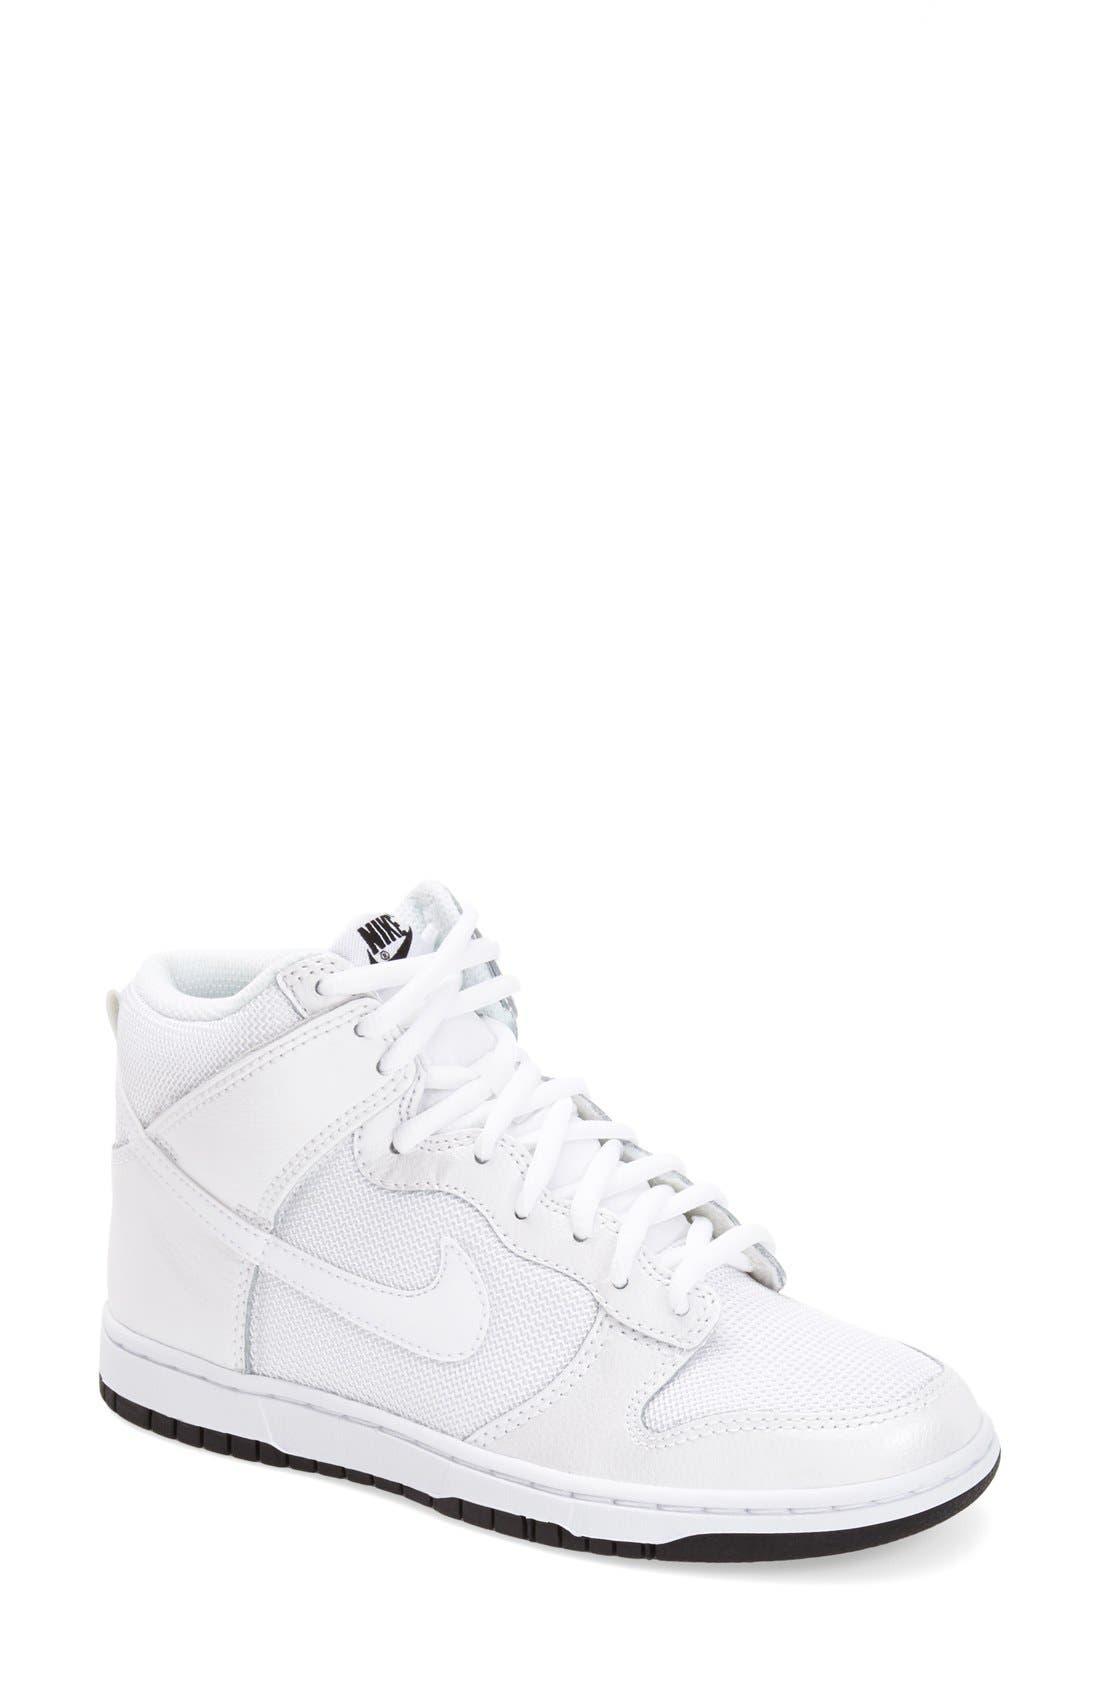 Alternate Image 1 Selected - Nike 'Dunk High Skinny' Sneaker (Women)